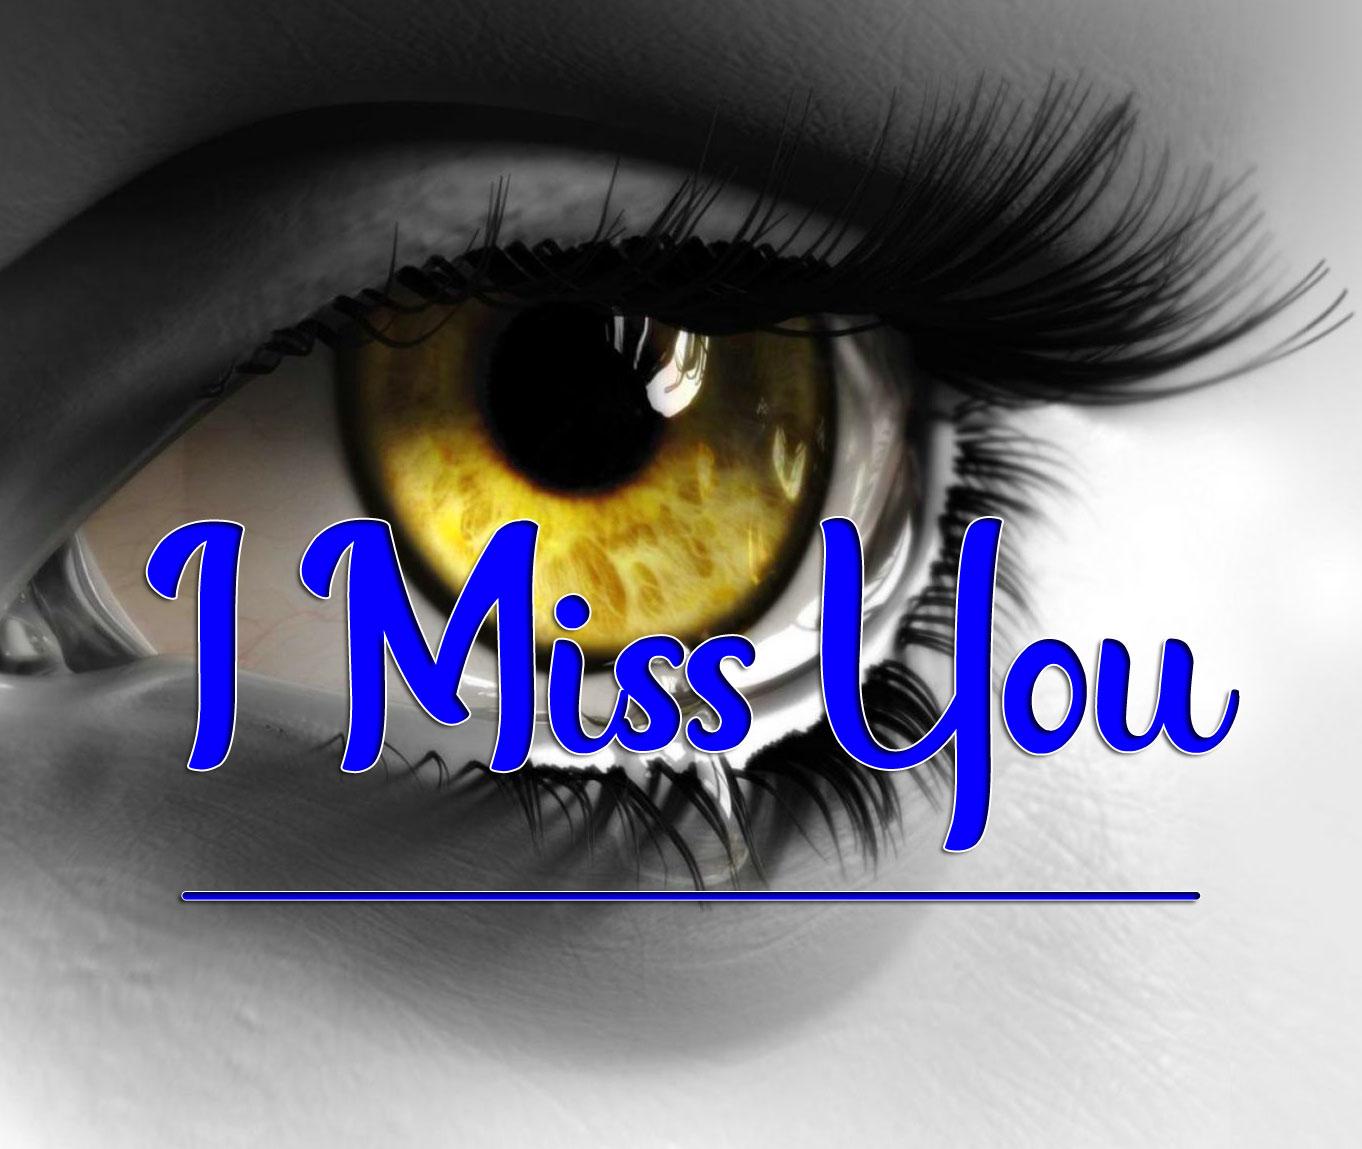 Sad Eye I miss you Images